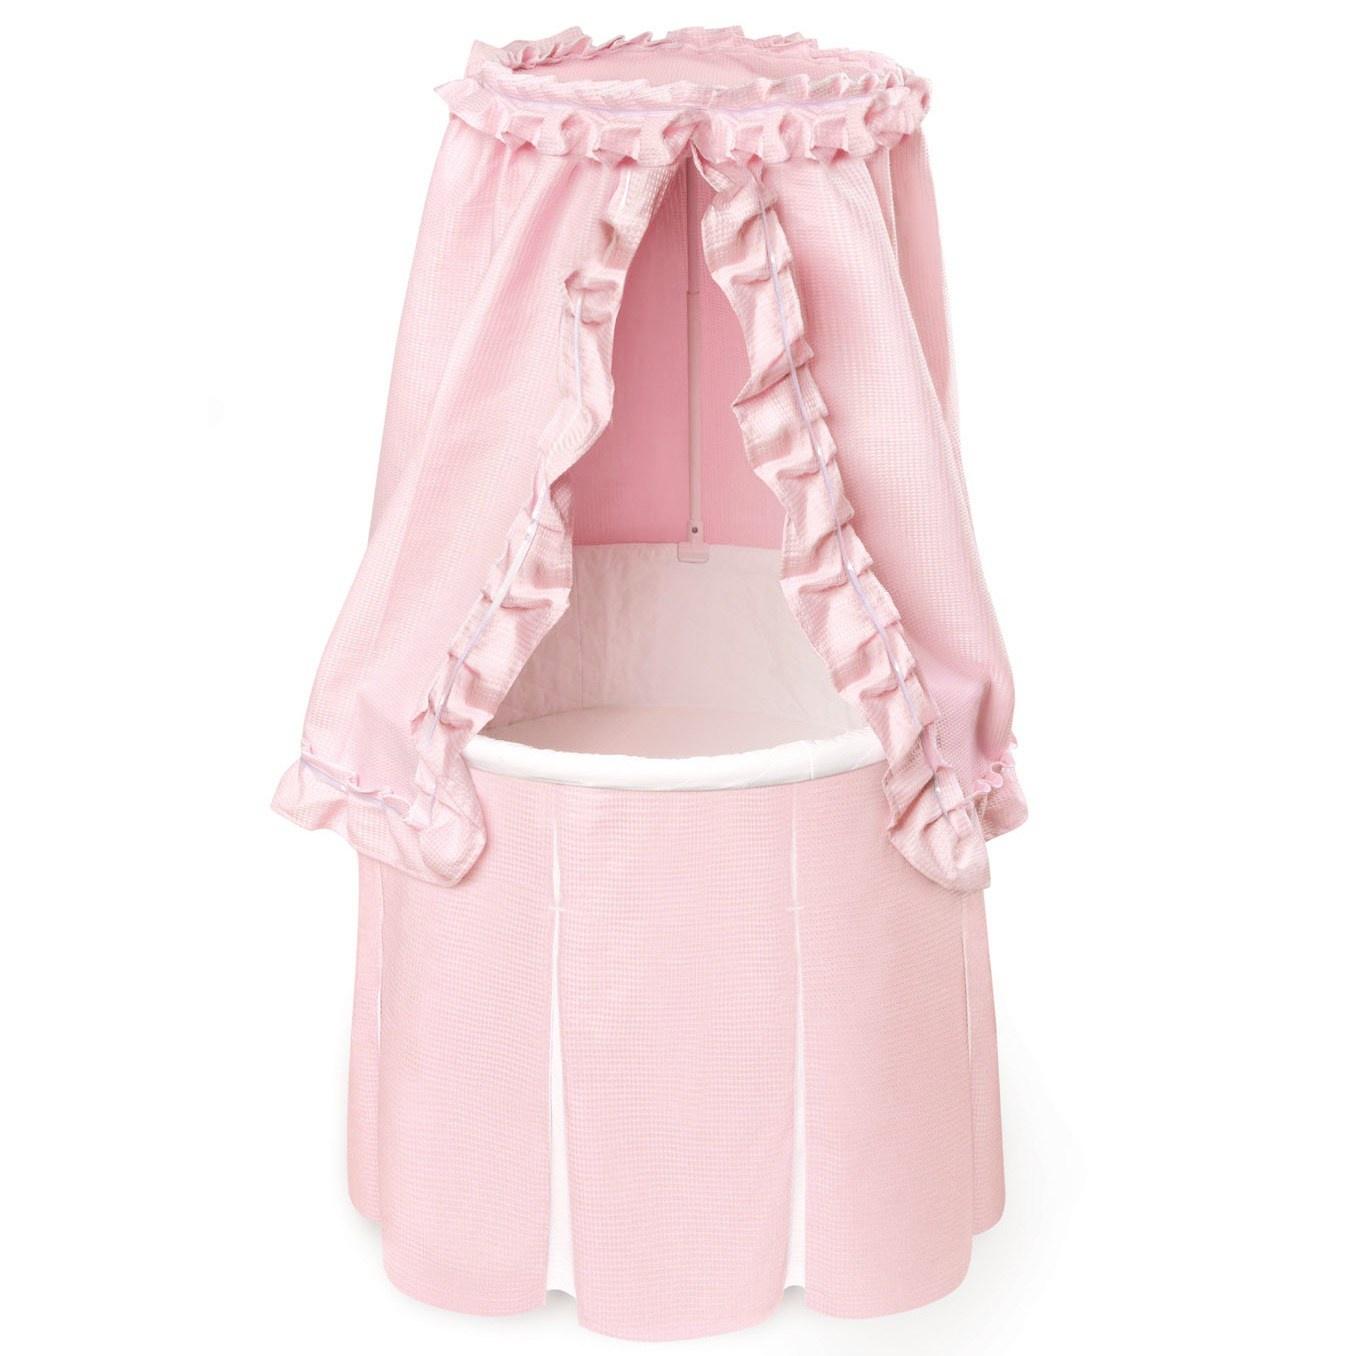 Колыбель Giovanni Solo Pink колыбель giovanni shapito solo white pink